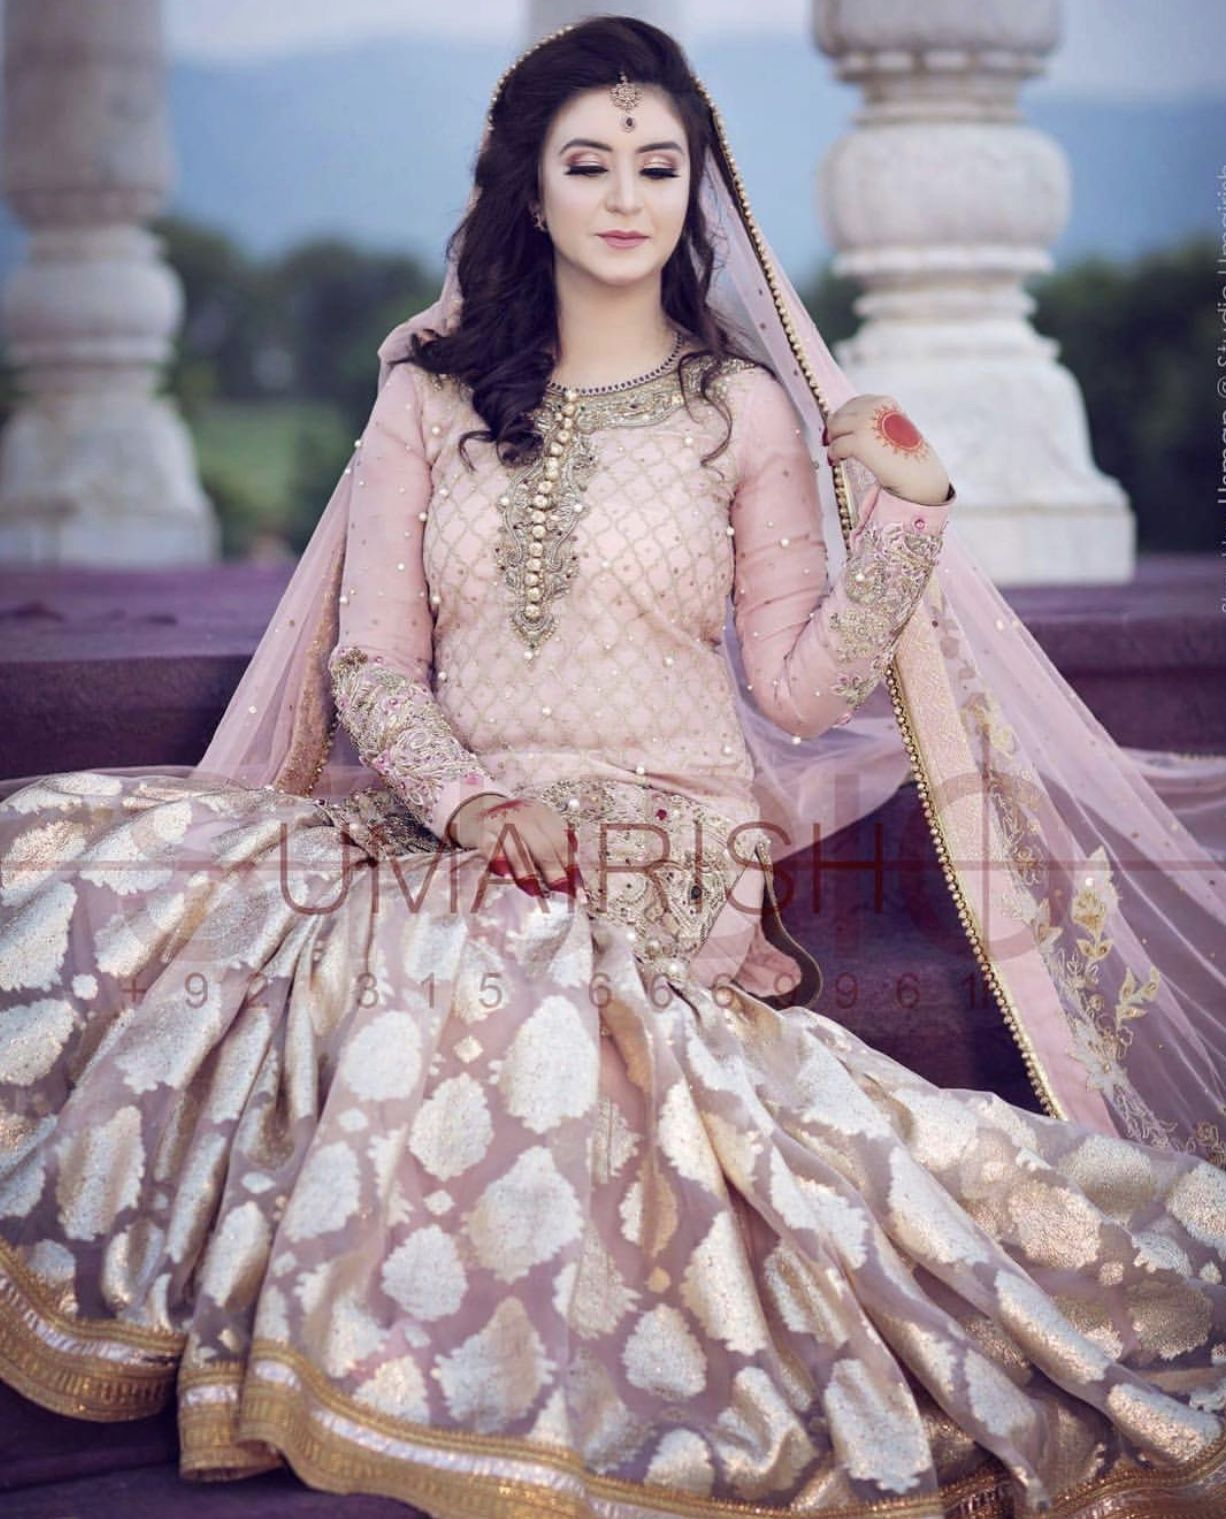 Hijab Engagement Dresses – 27 Beautiful Engagement Dresses for Hijabis Hijab Engagement Dresses – 27 Beautiful Engagement Dresses for Hijabis new images